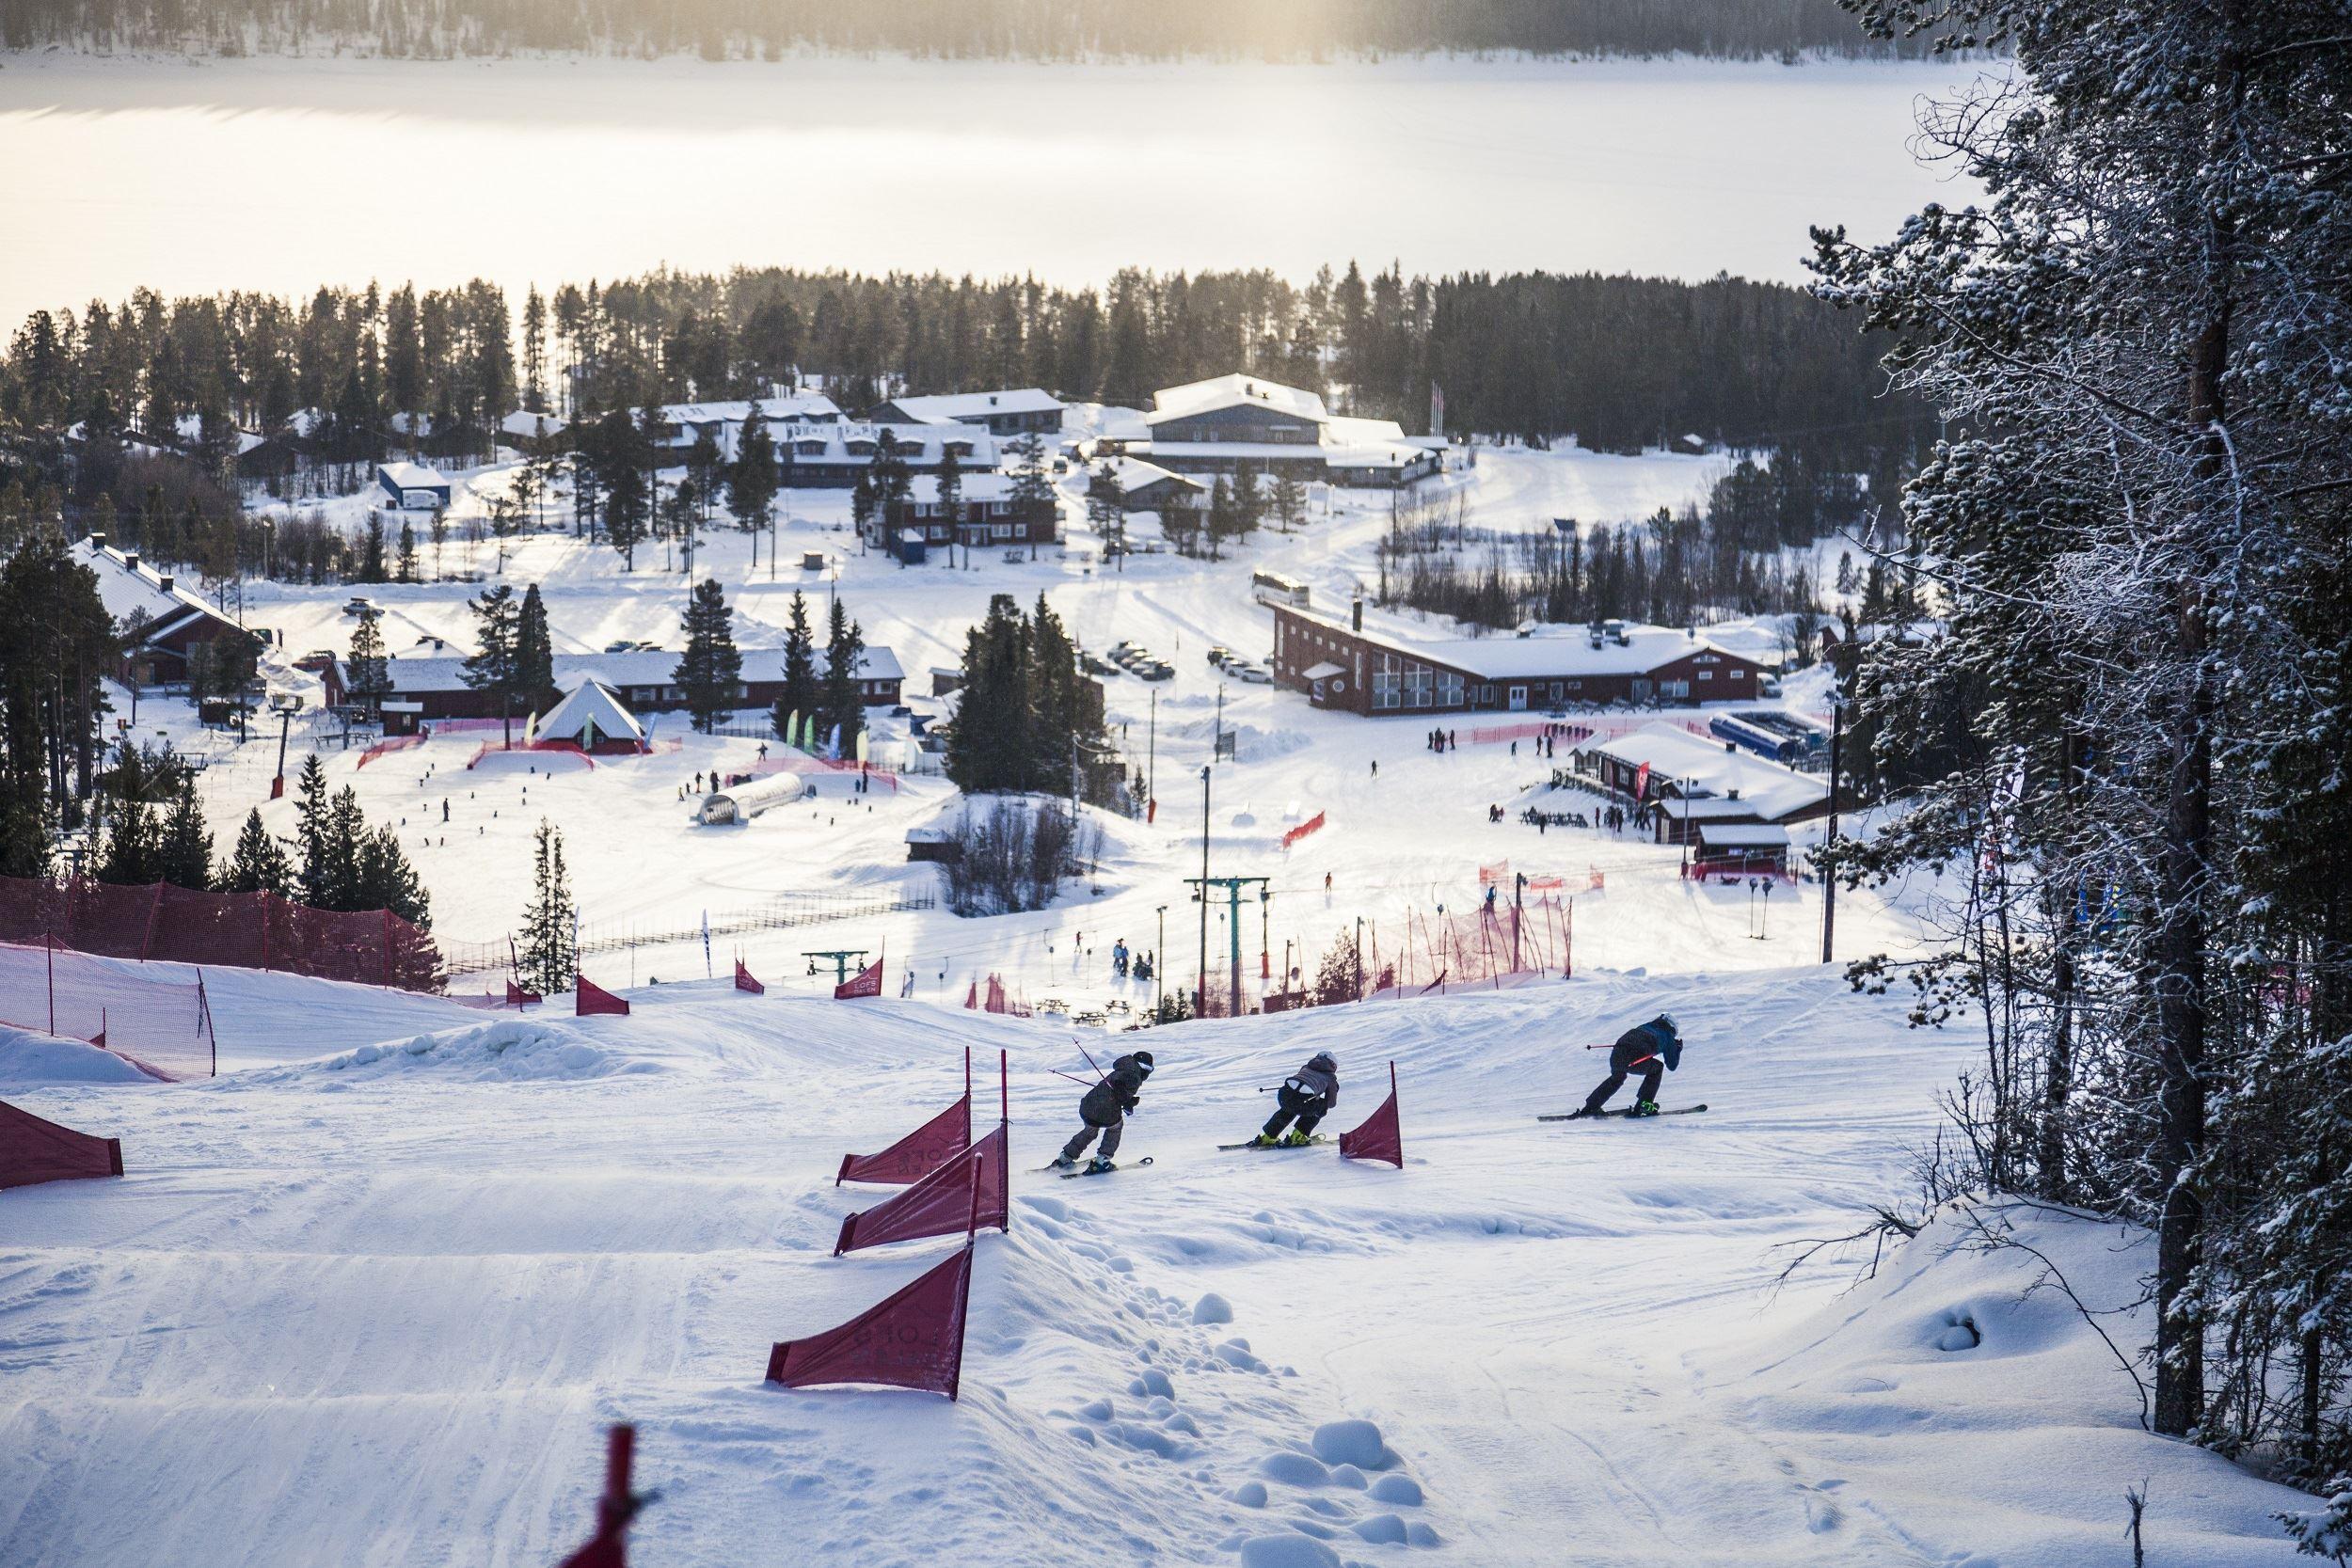 Skicrossåkare i skicrossbana